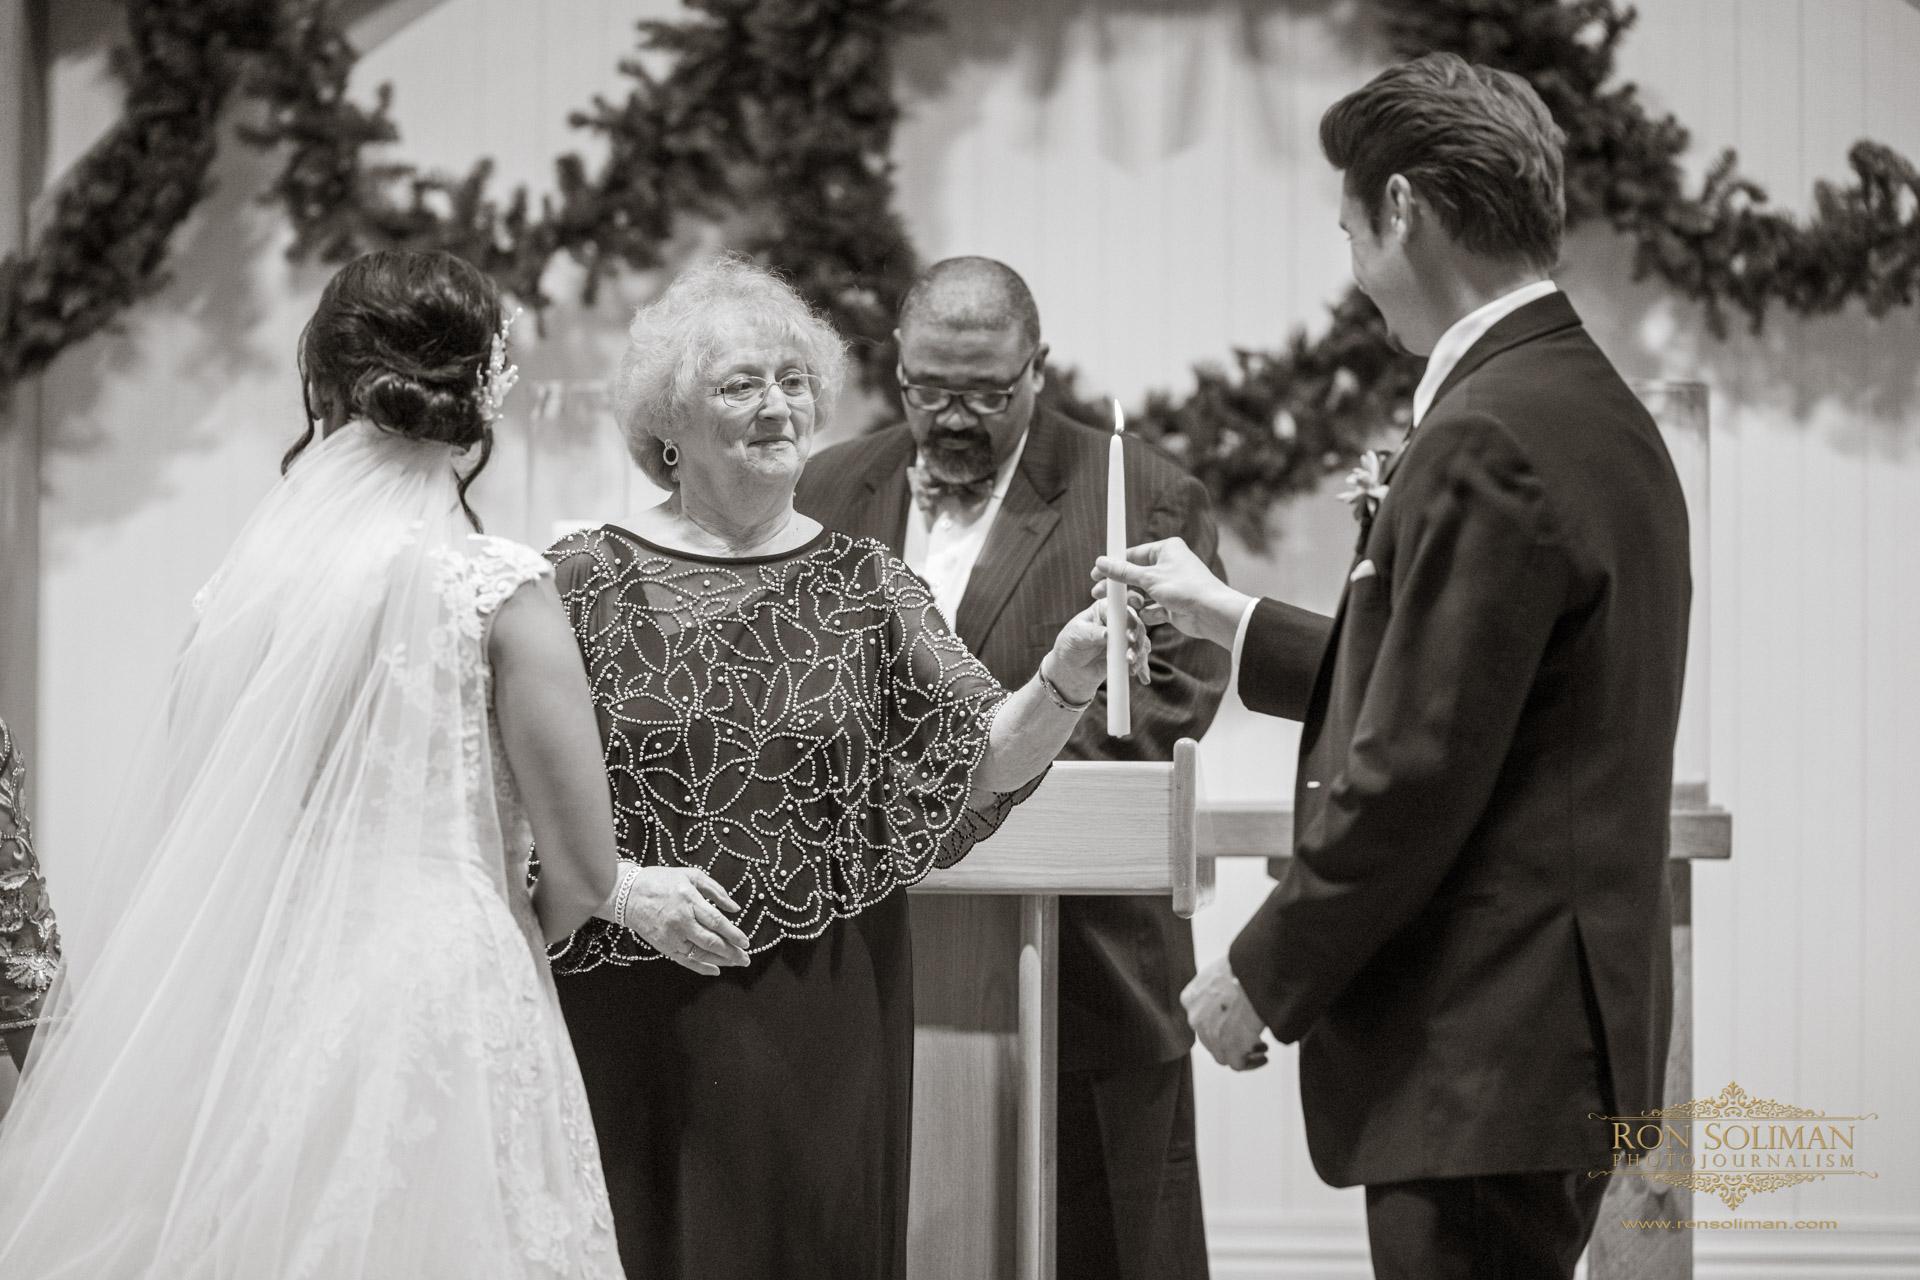 THE GREENBRIER RESORT WEDDING 33